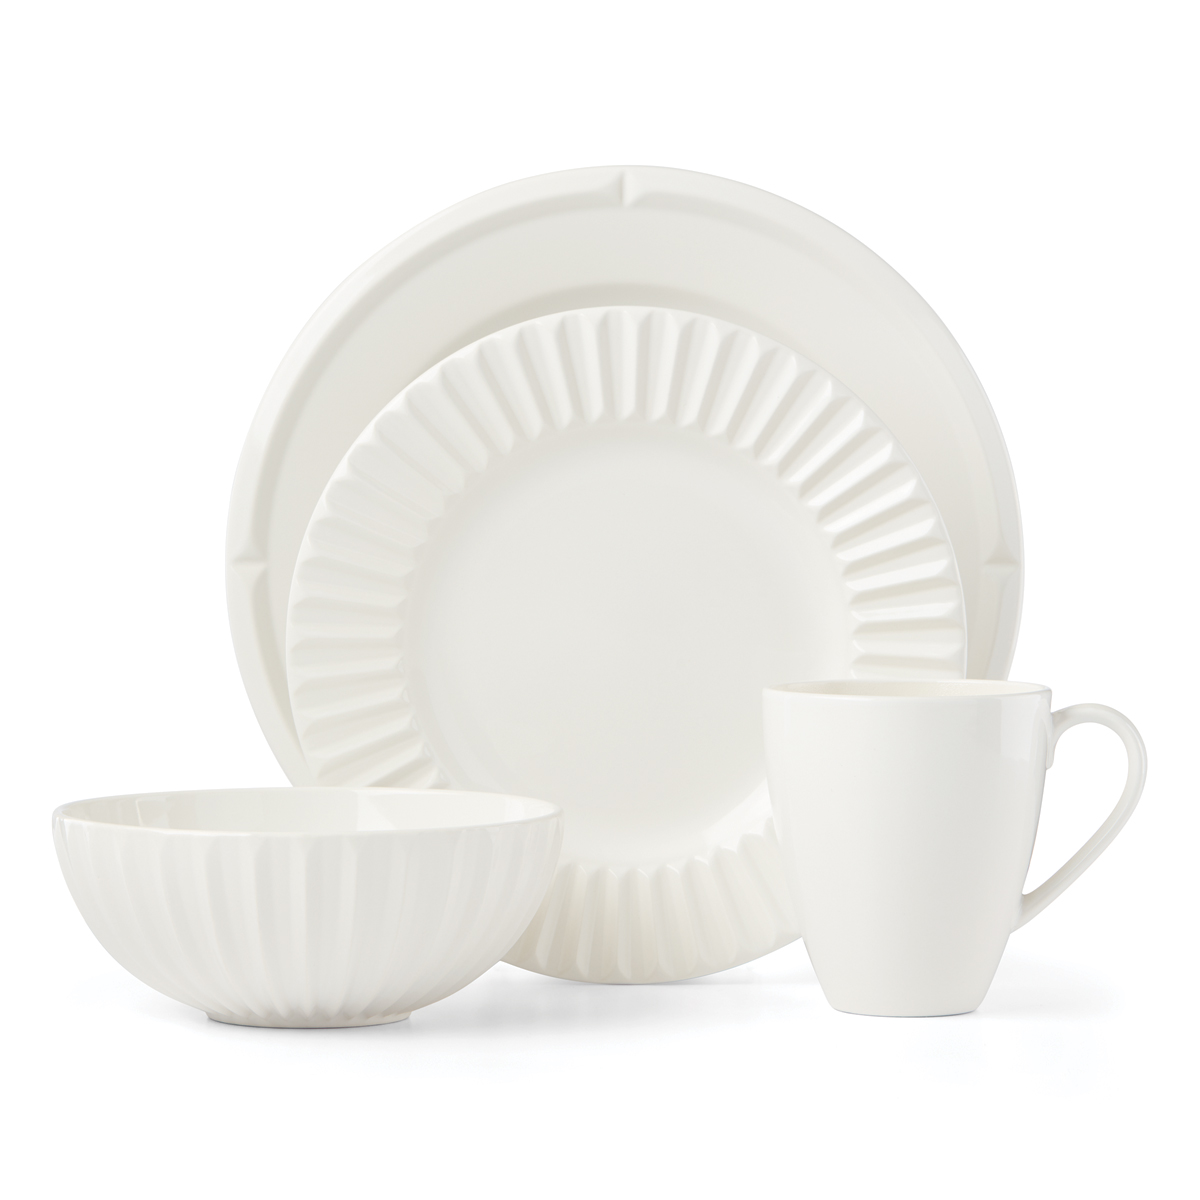 Kate Spade China by Lenox, Tribeca Cream 4 Piece Plate Set